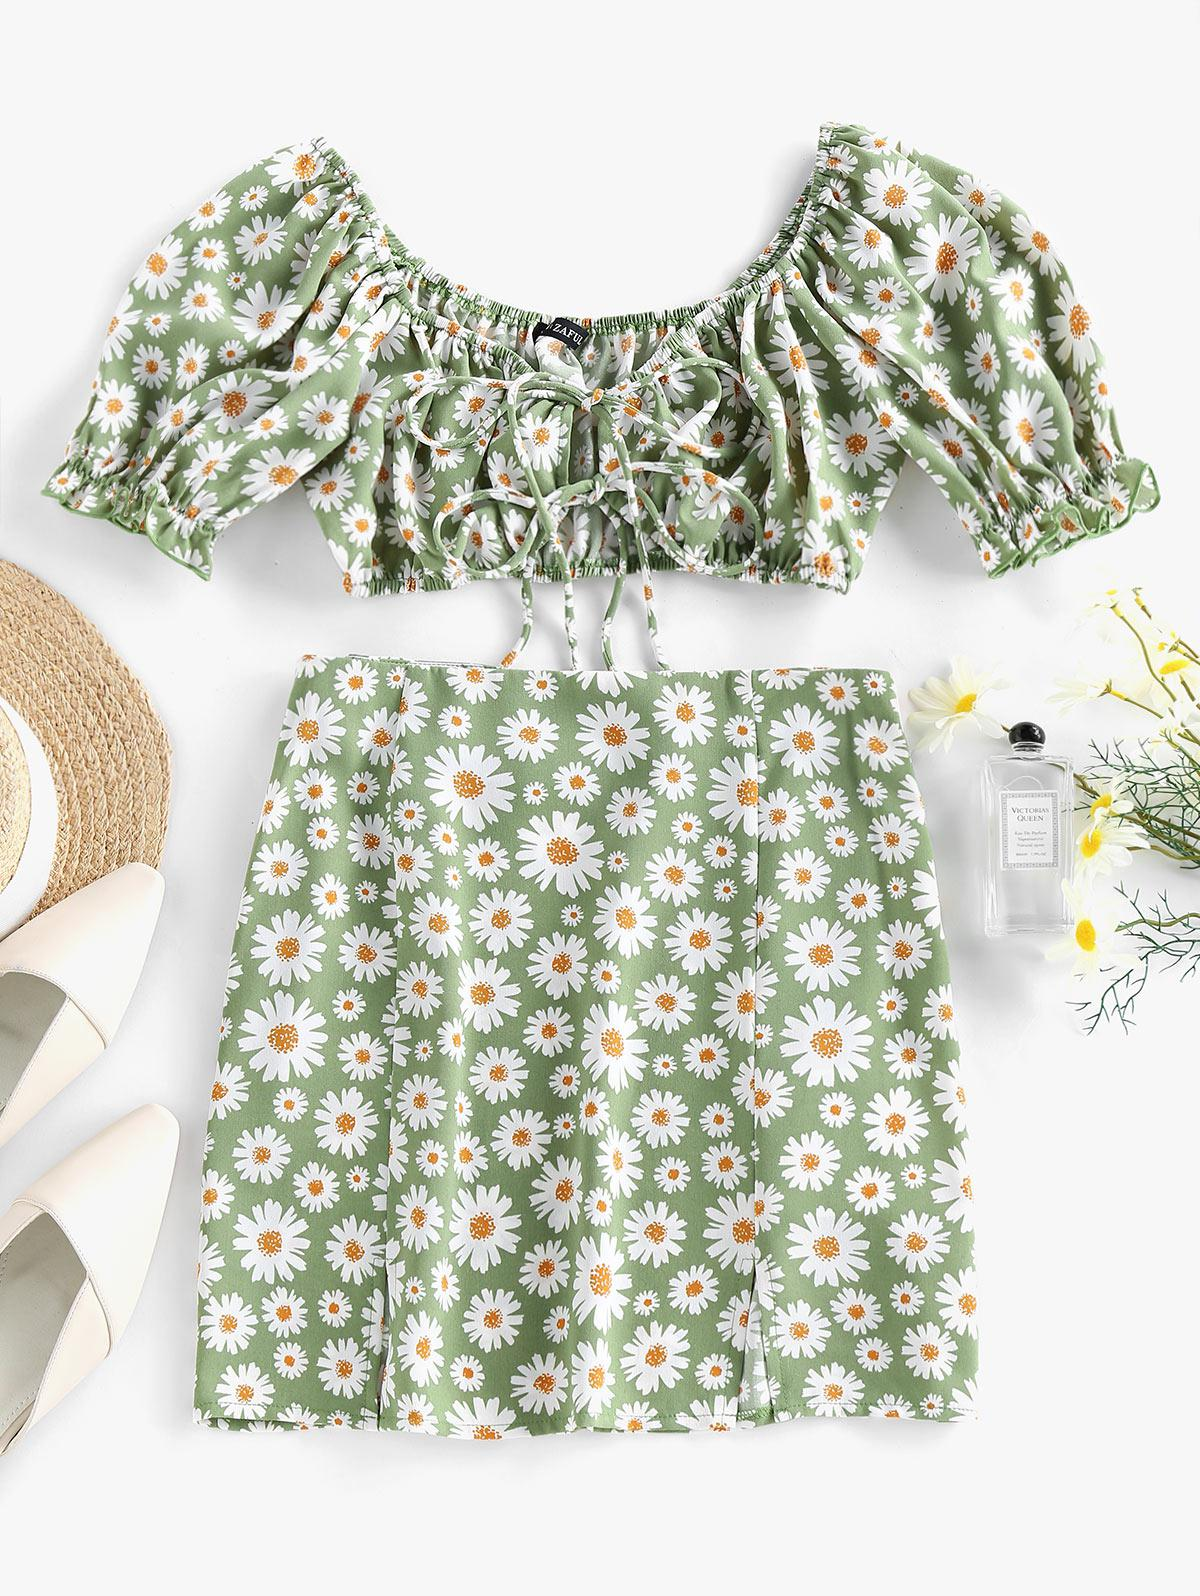 ZAFUL Daisy Print Slit Tie Front Ruffle Skirt Set